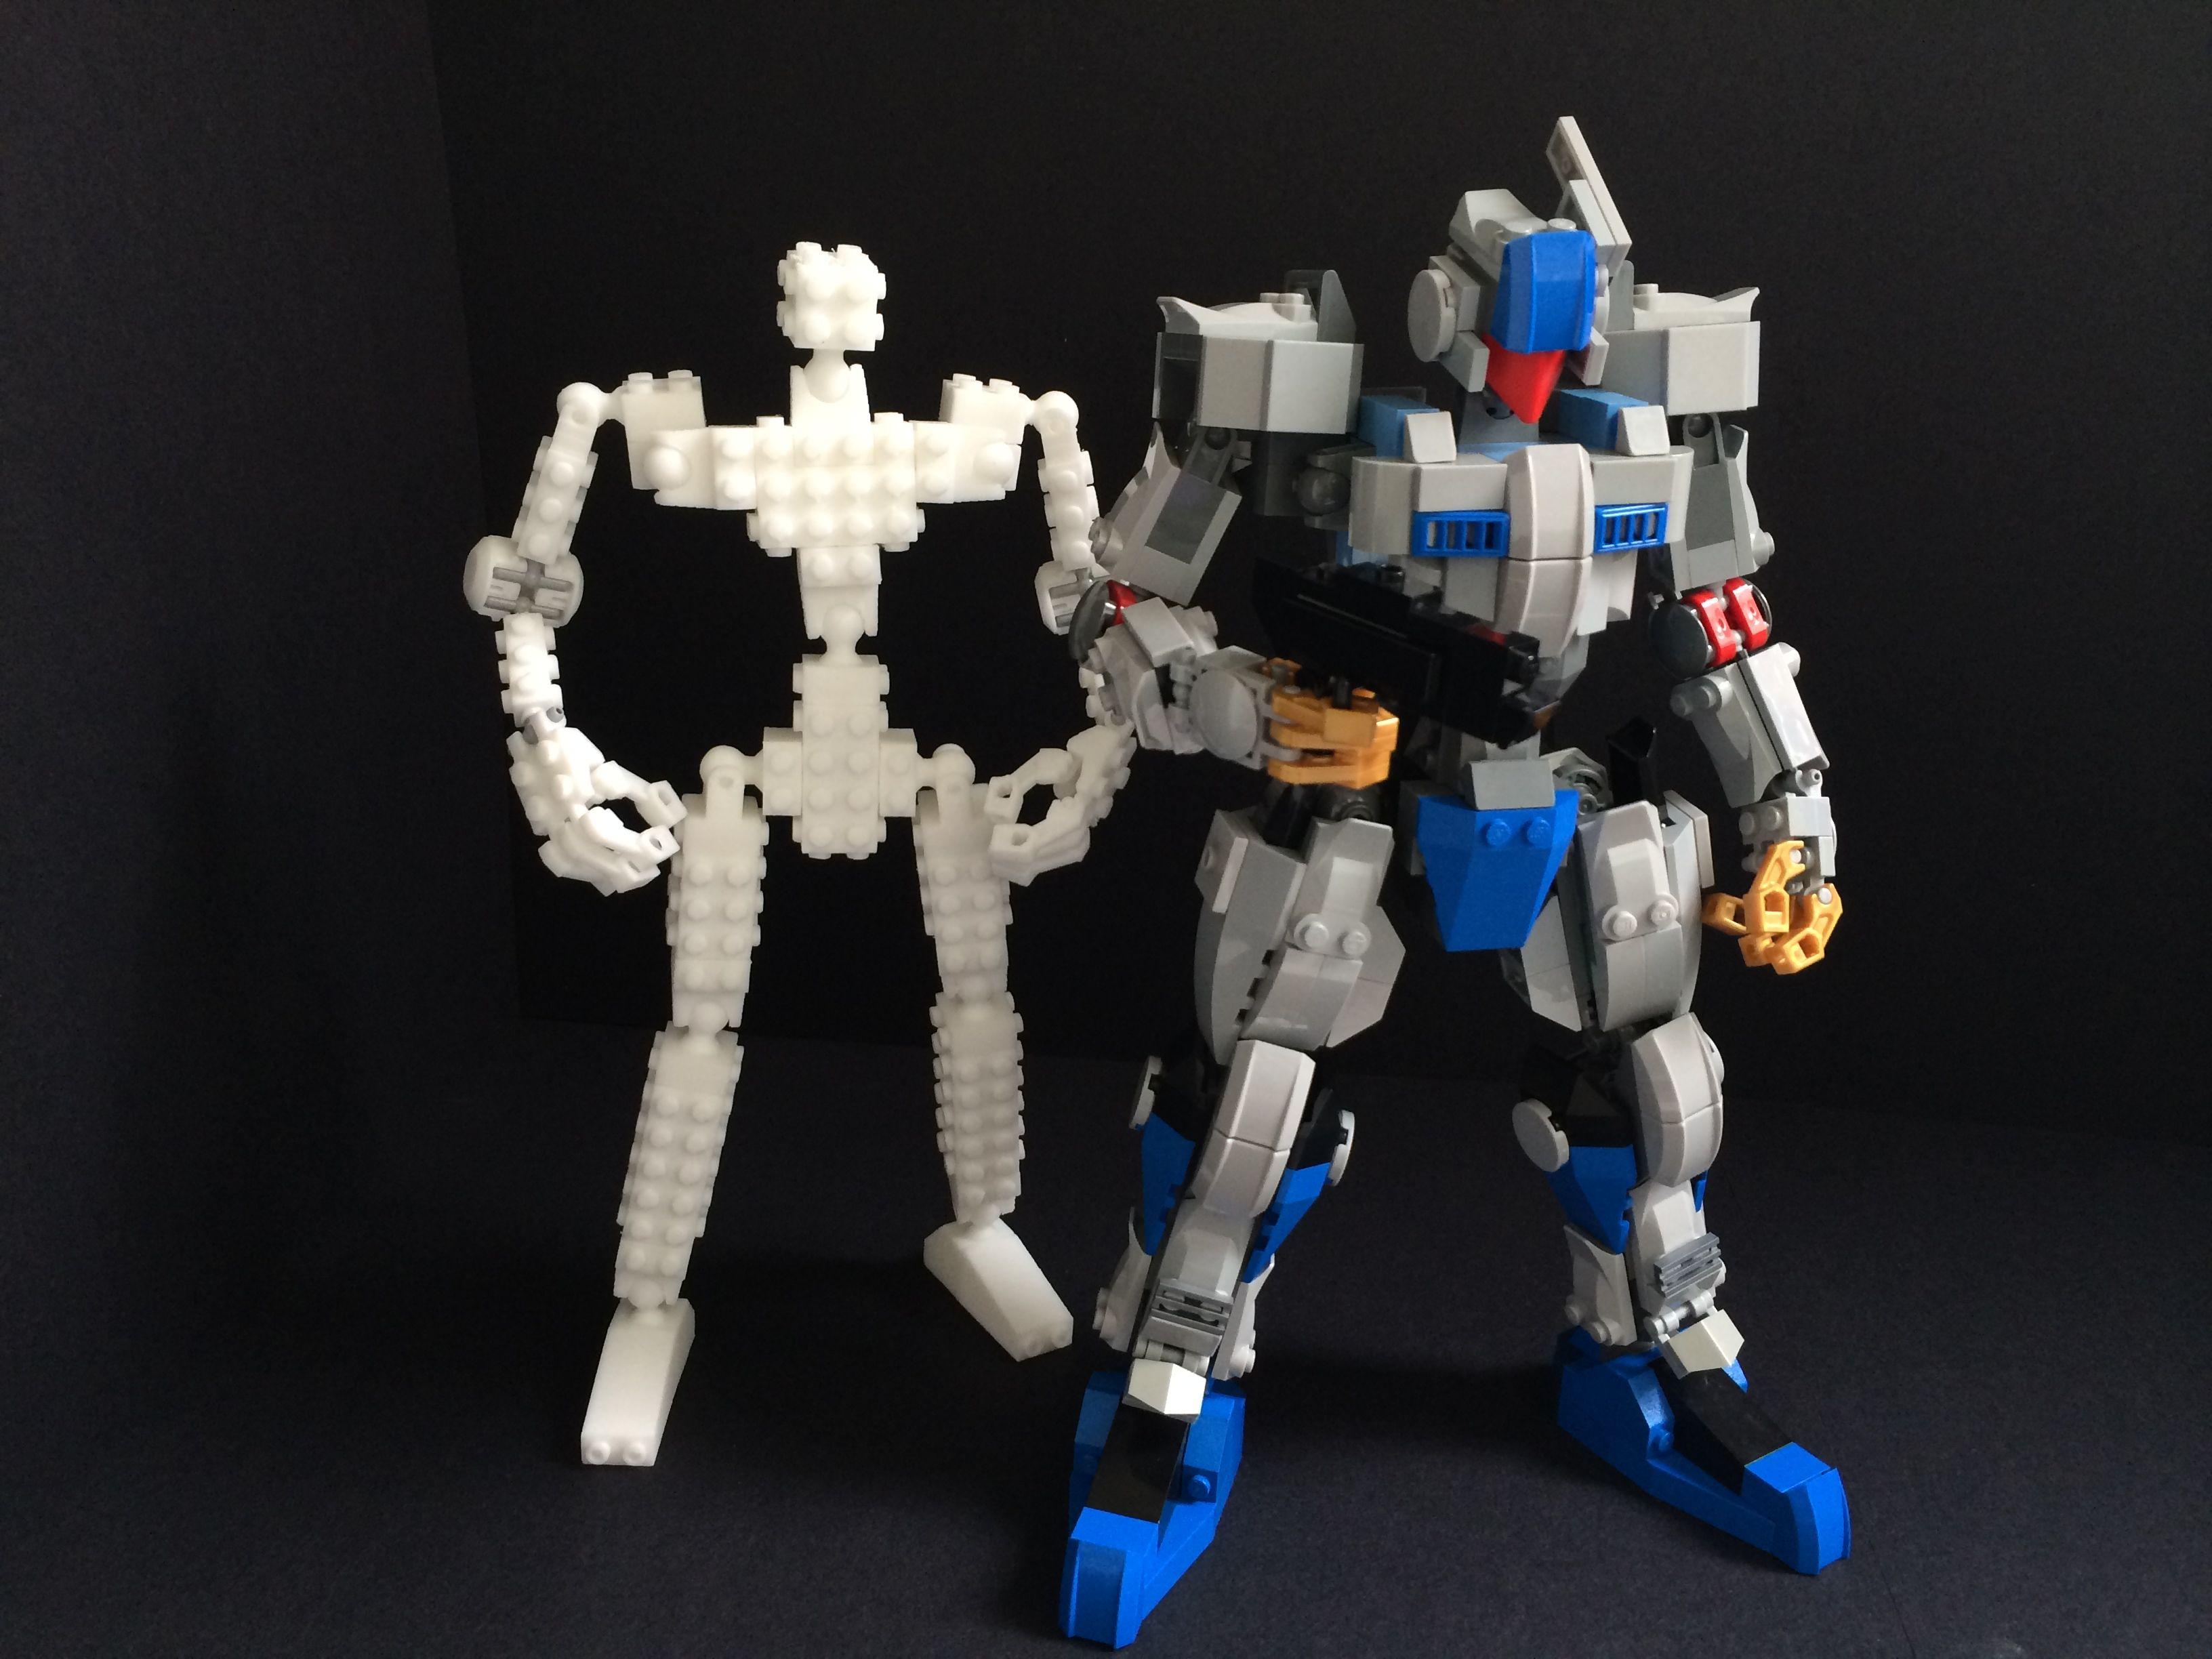 LEGO Compatible Robot Frame by MyBuild | Hero Design Studio︱Home